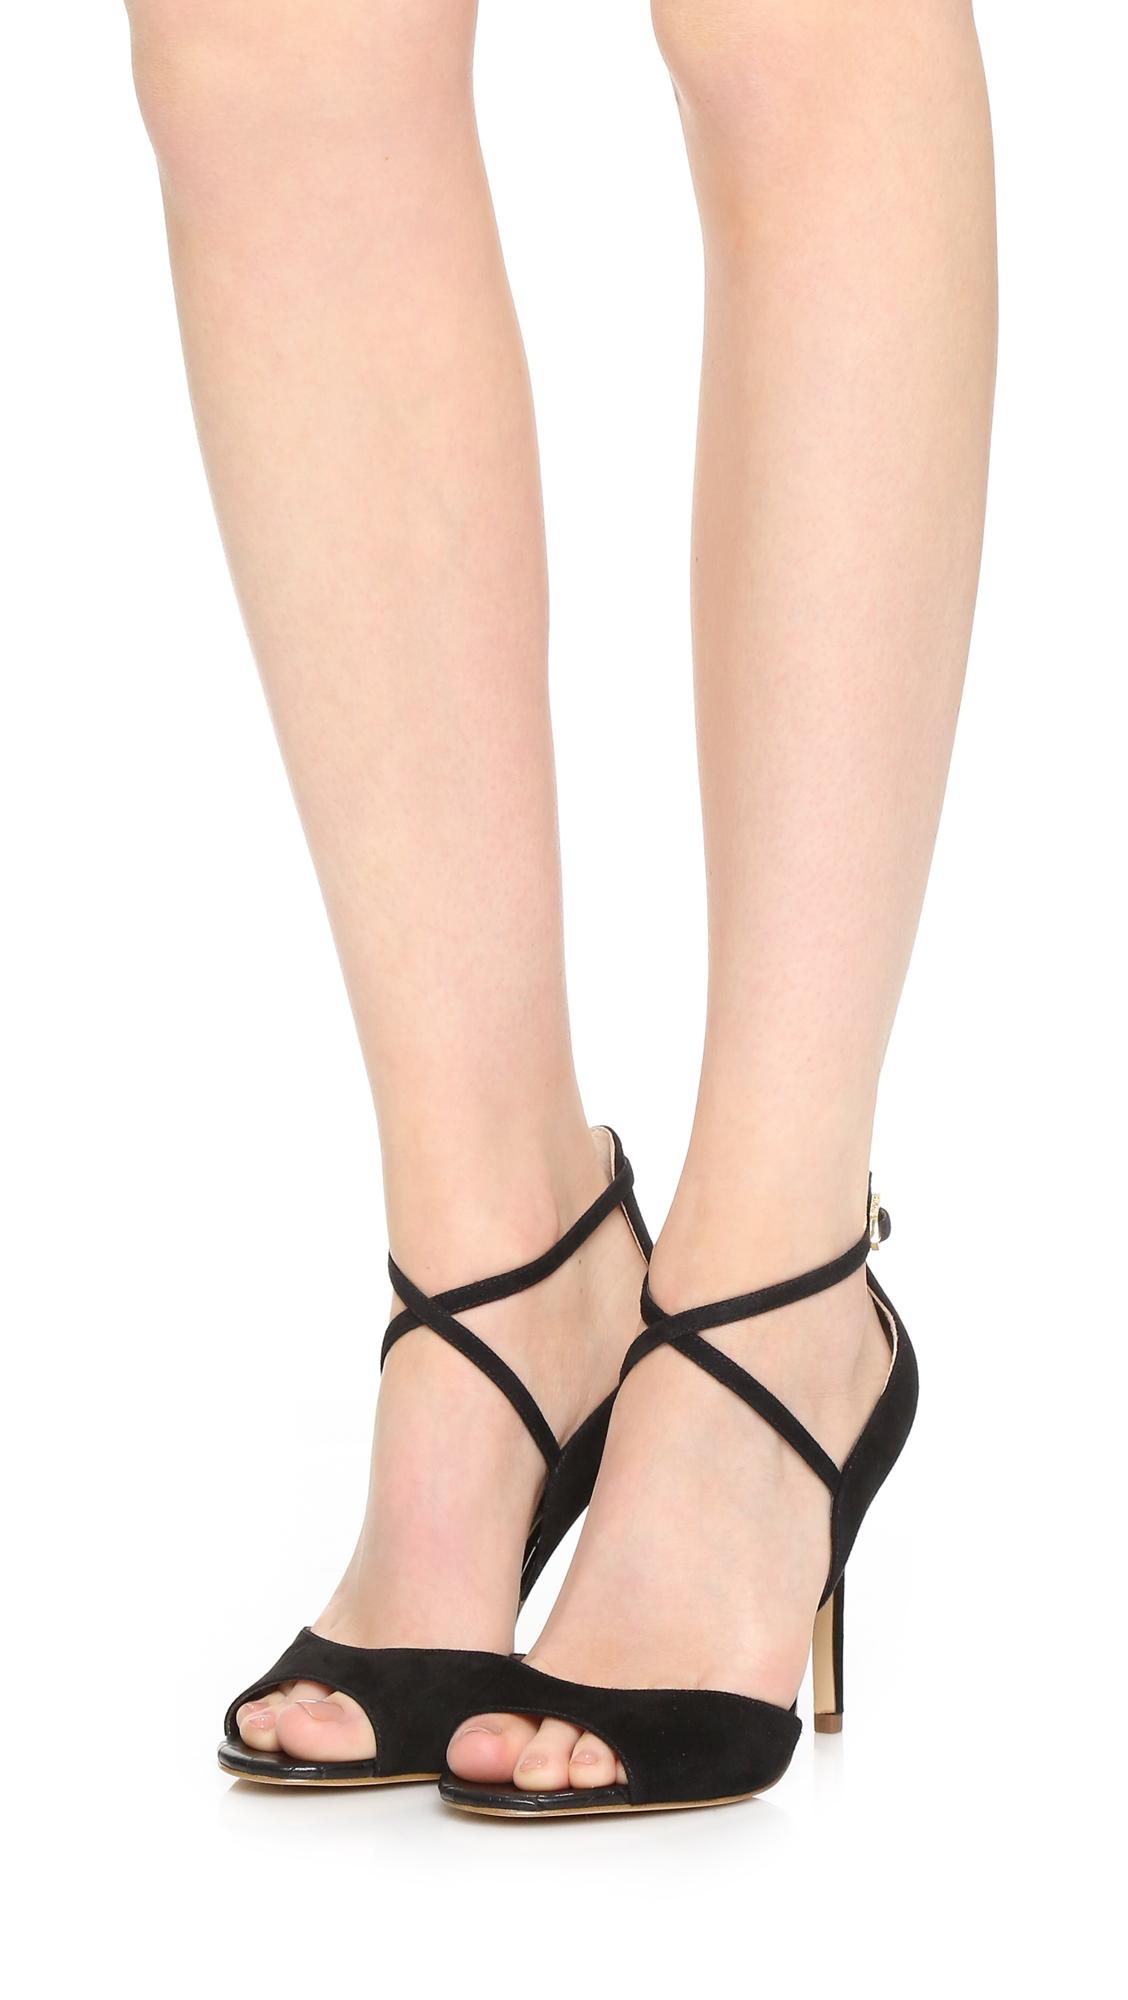 Womens Sam Edelman Women's Audrey Dress Sandal For Sale Online Size 38